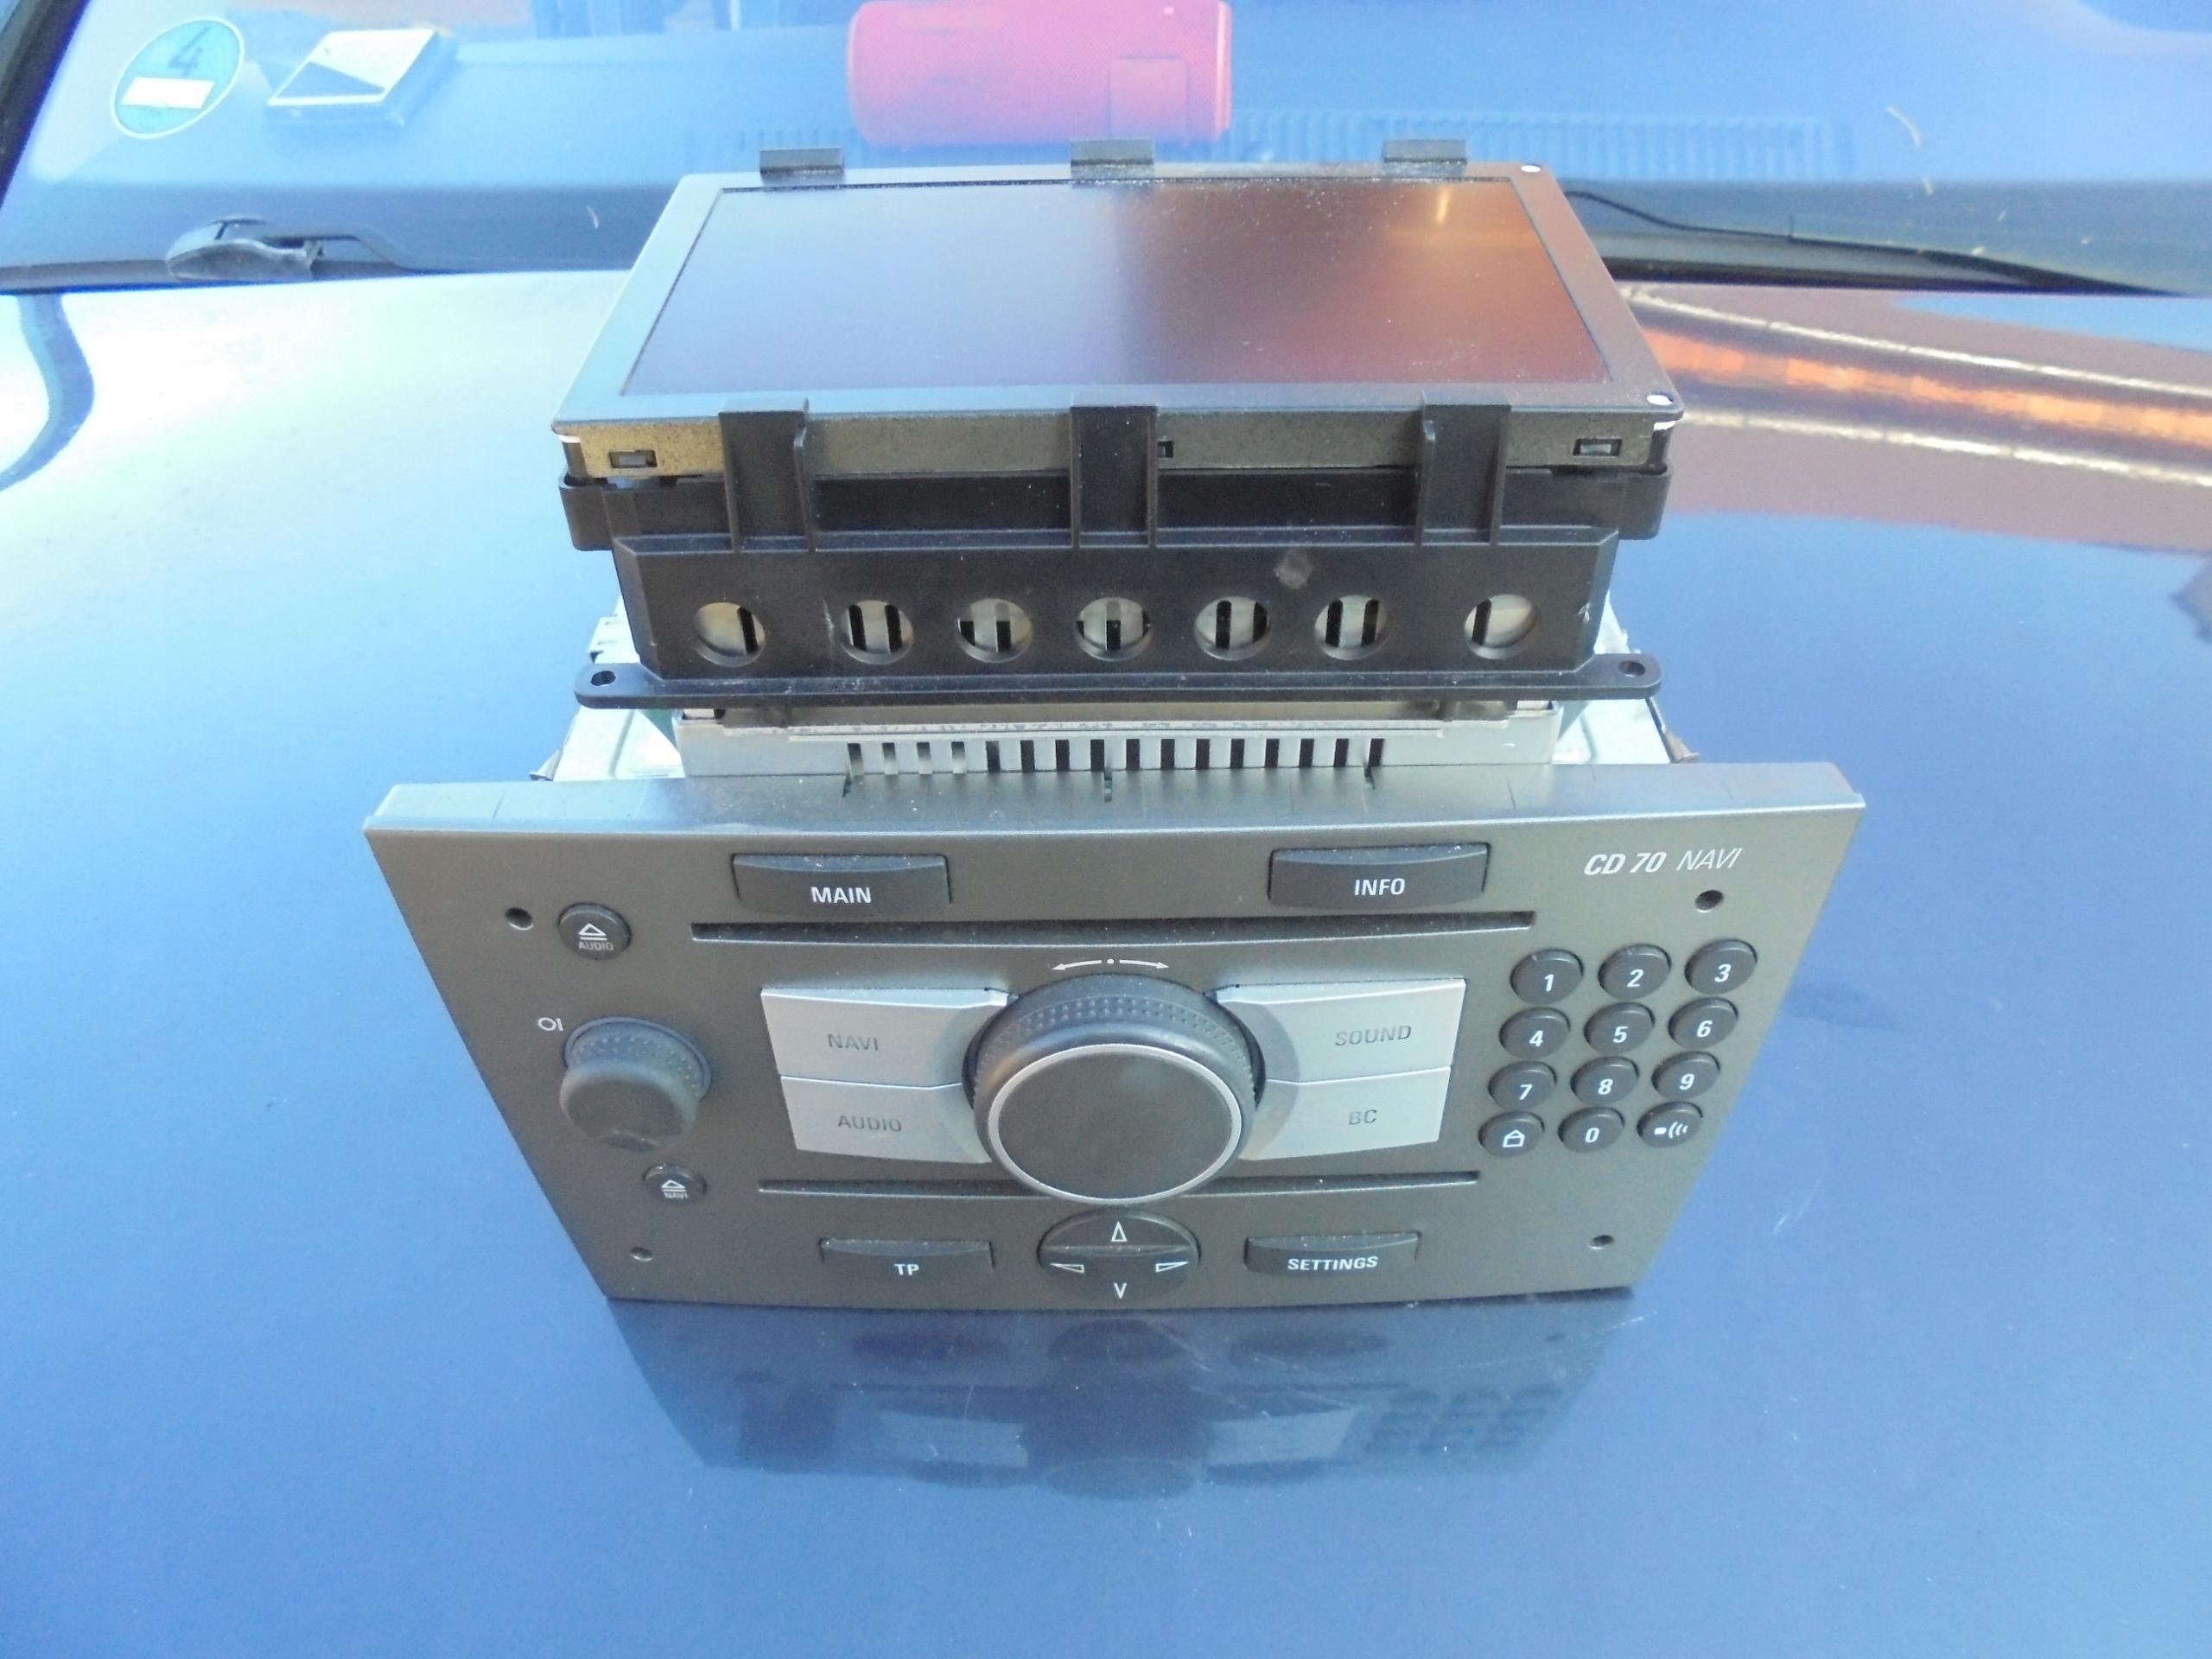 vectra c радио cd 70 navi   дисплей антенна